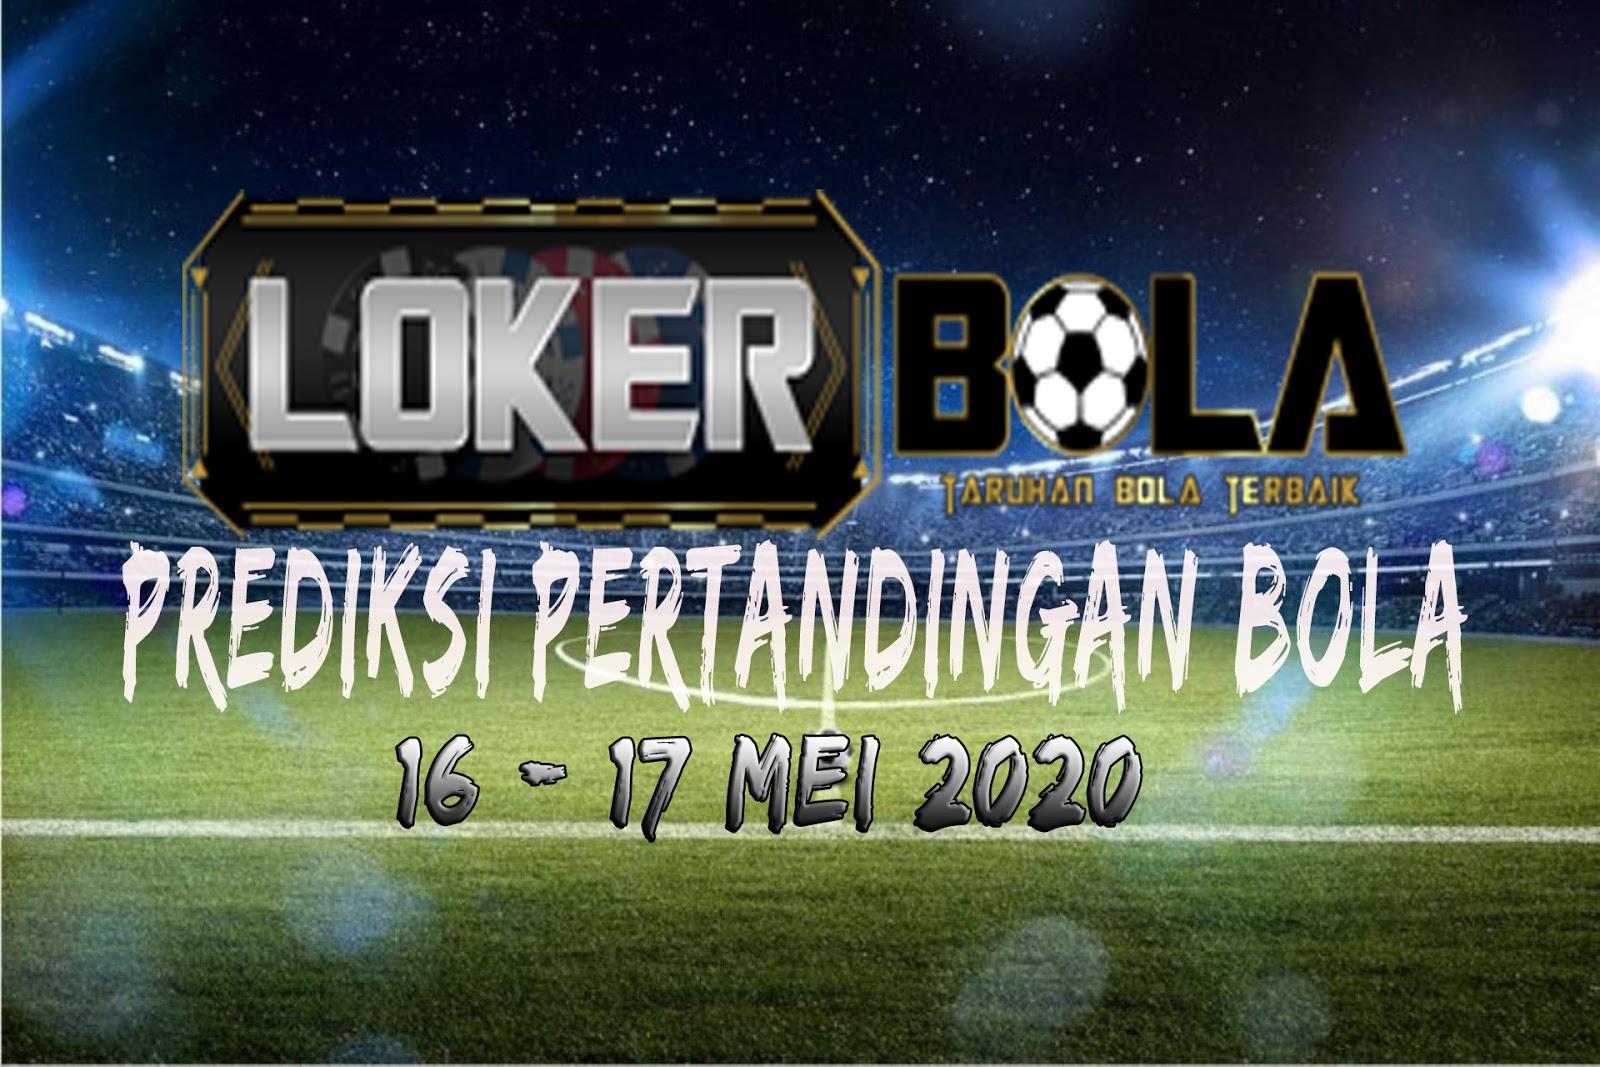 PREDIKSI PERTANDINGAN BOLA 16 – 17 May 2020